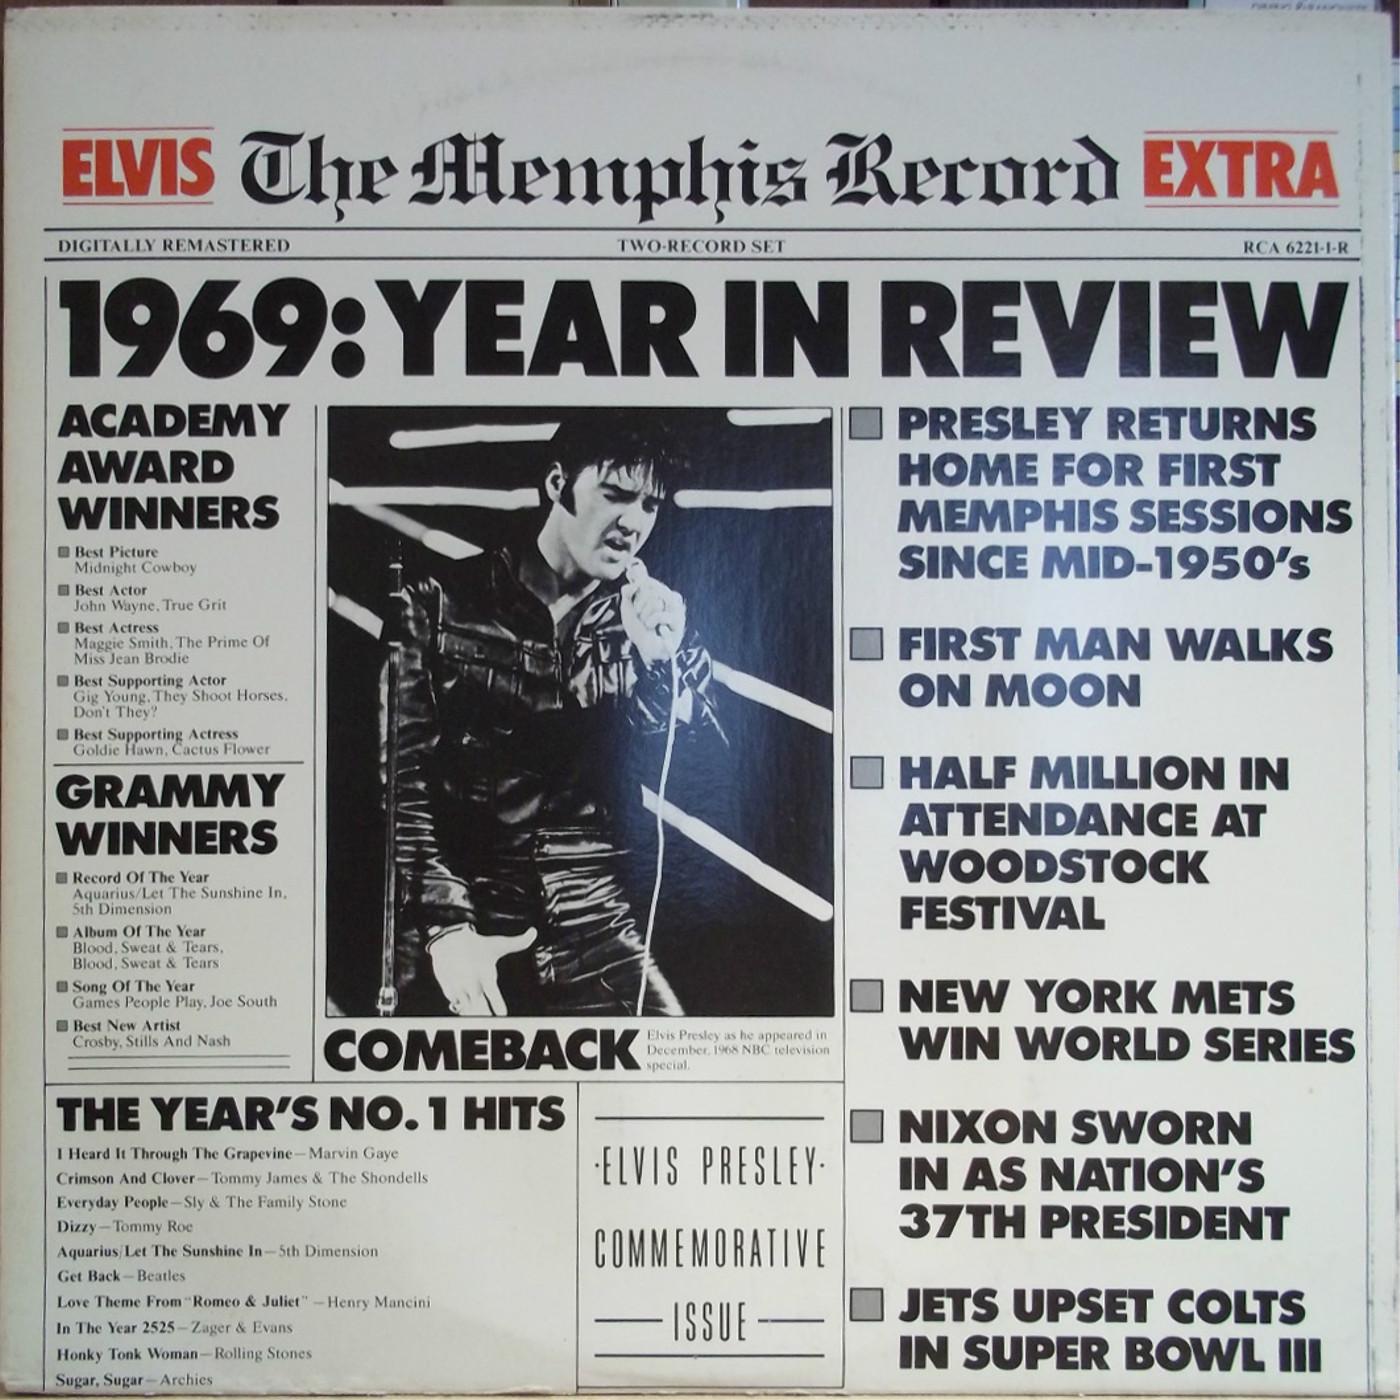 THE MEMPHIS RECORD 6221-1-r-vornceuvp